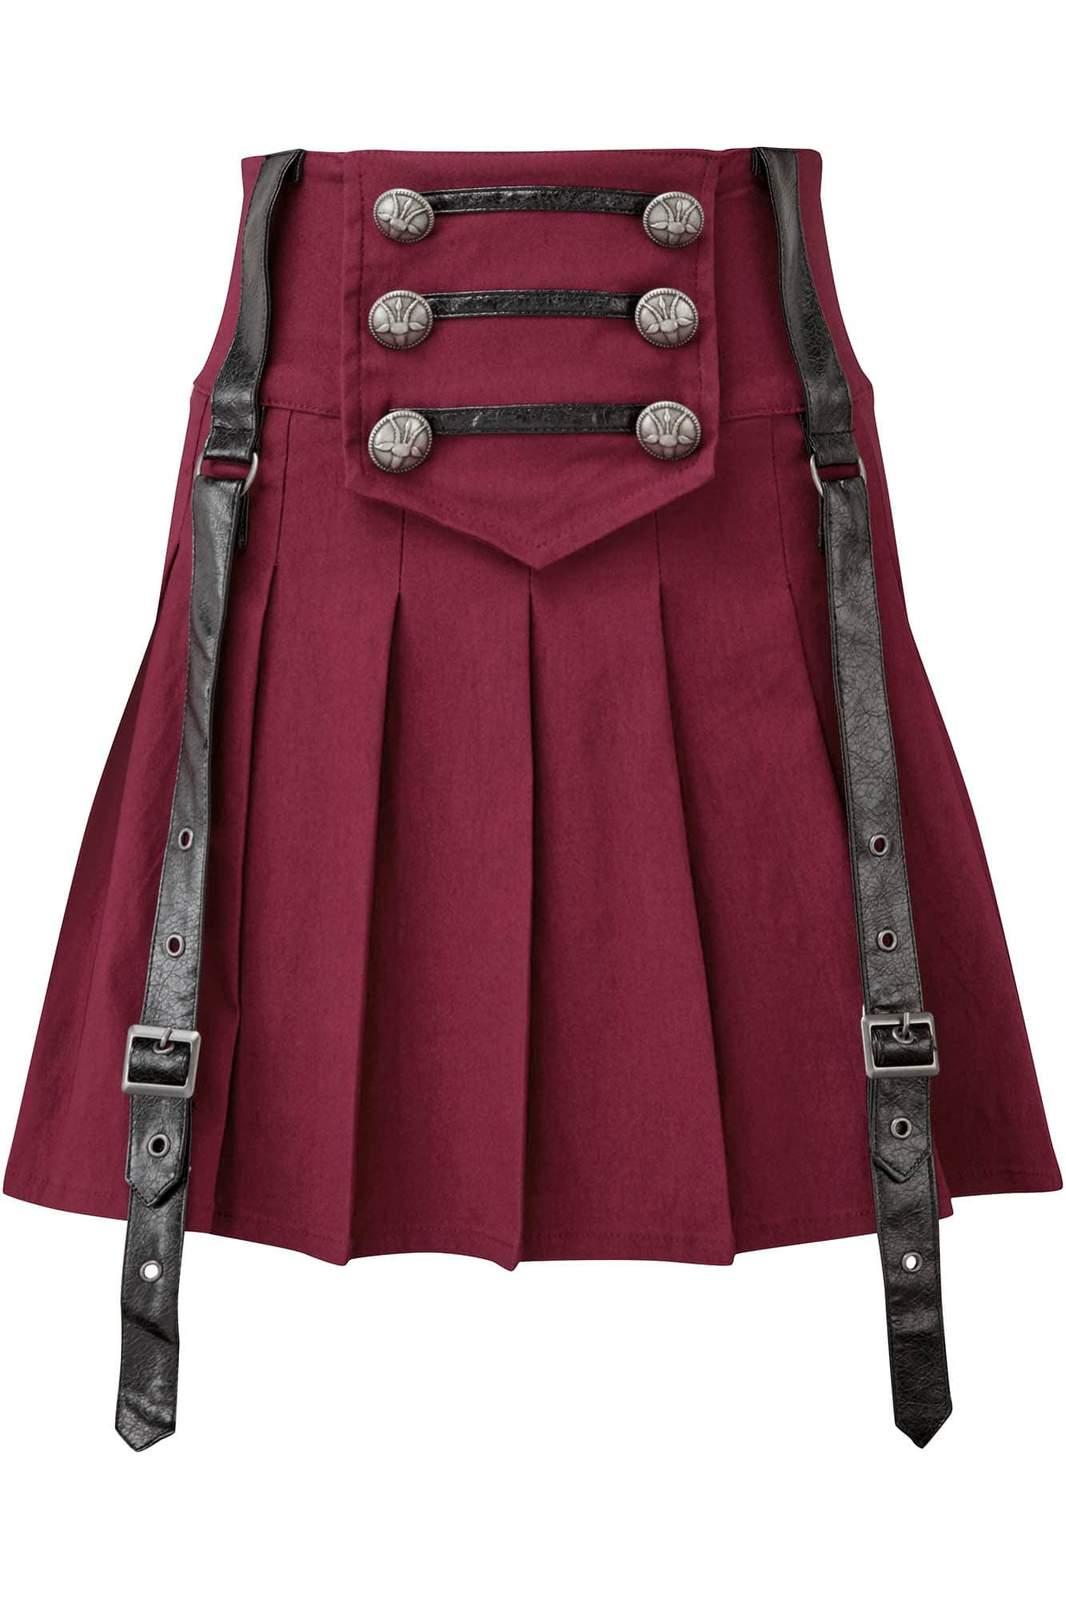 Dark Academy Mini Skirt Blood by Killstar